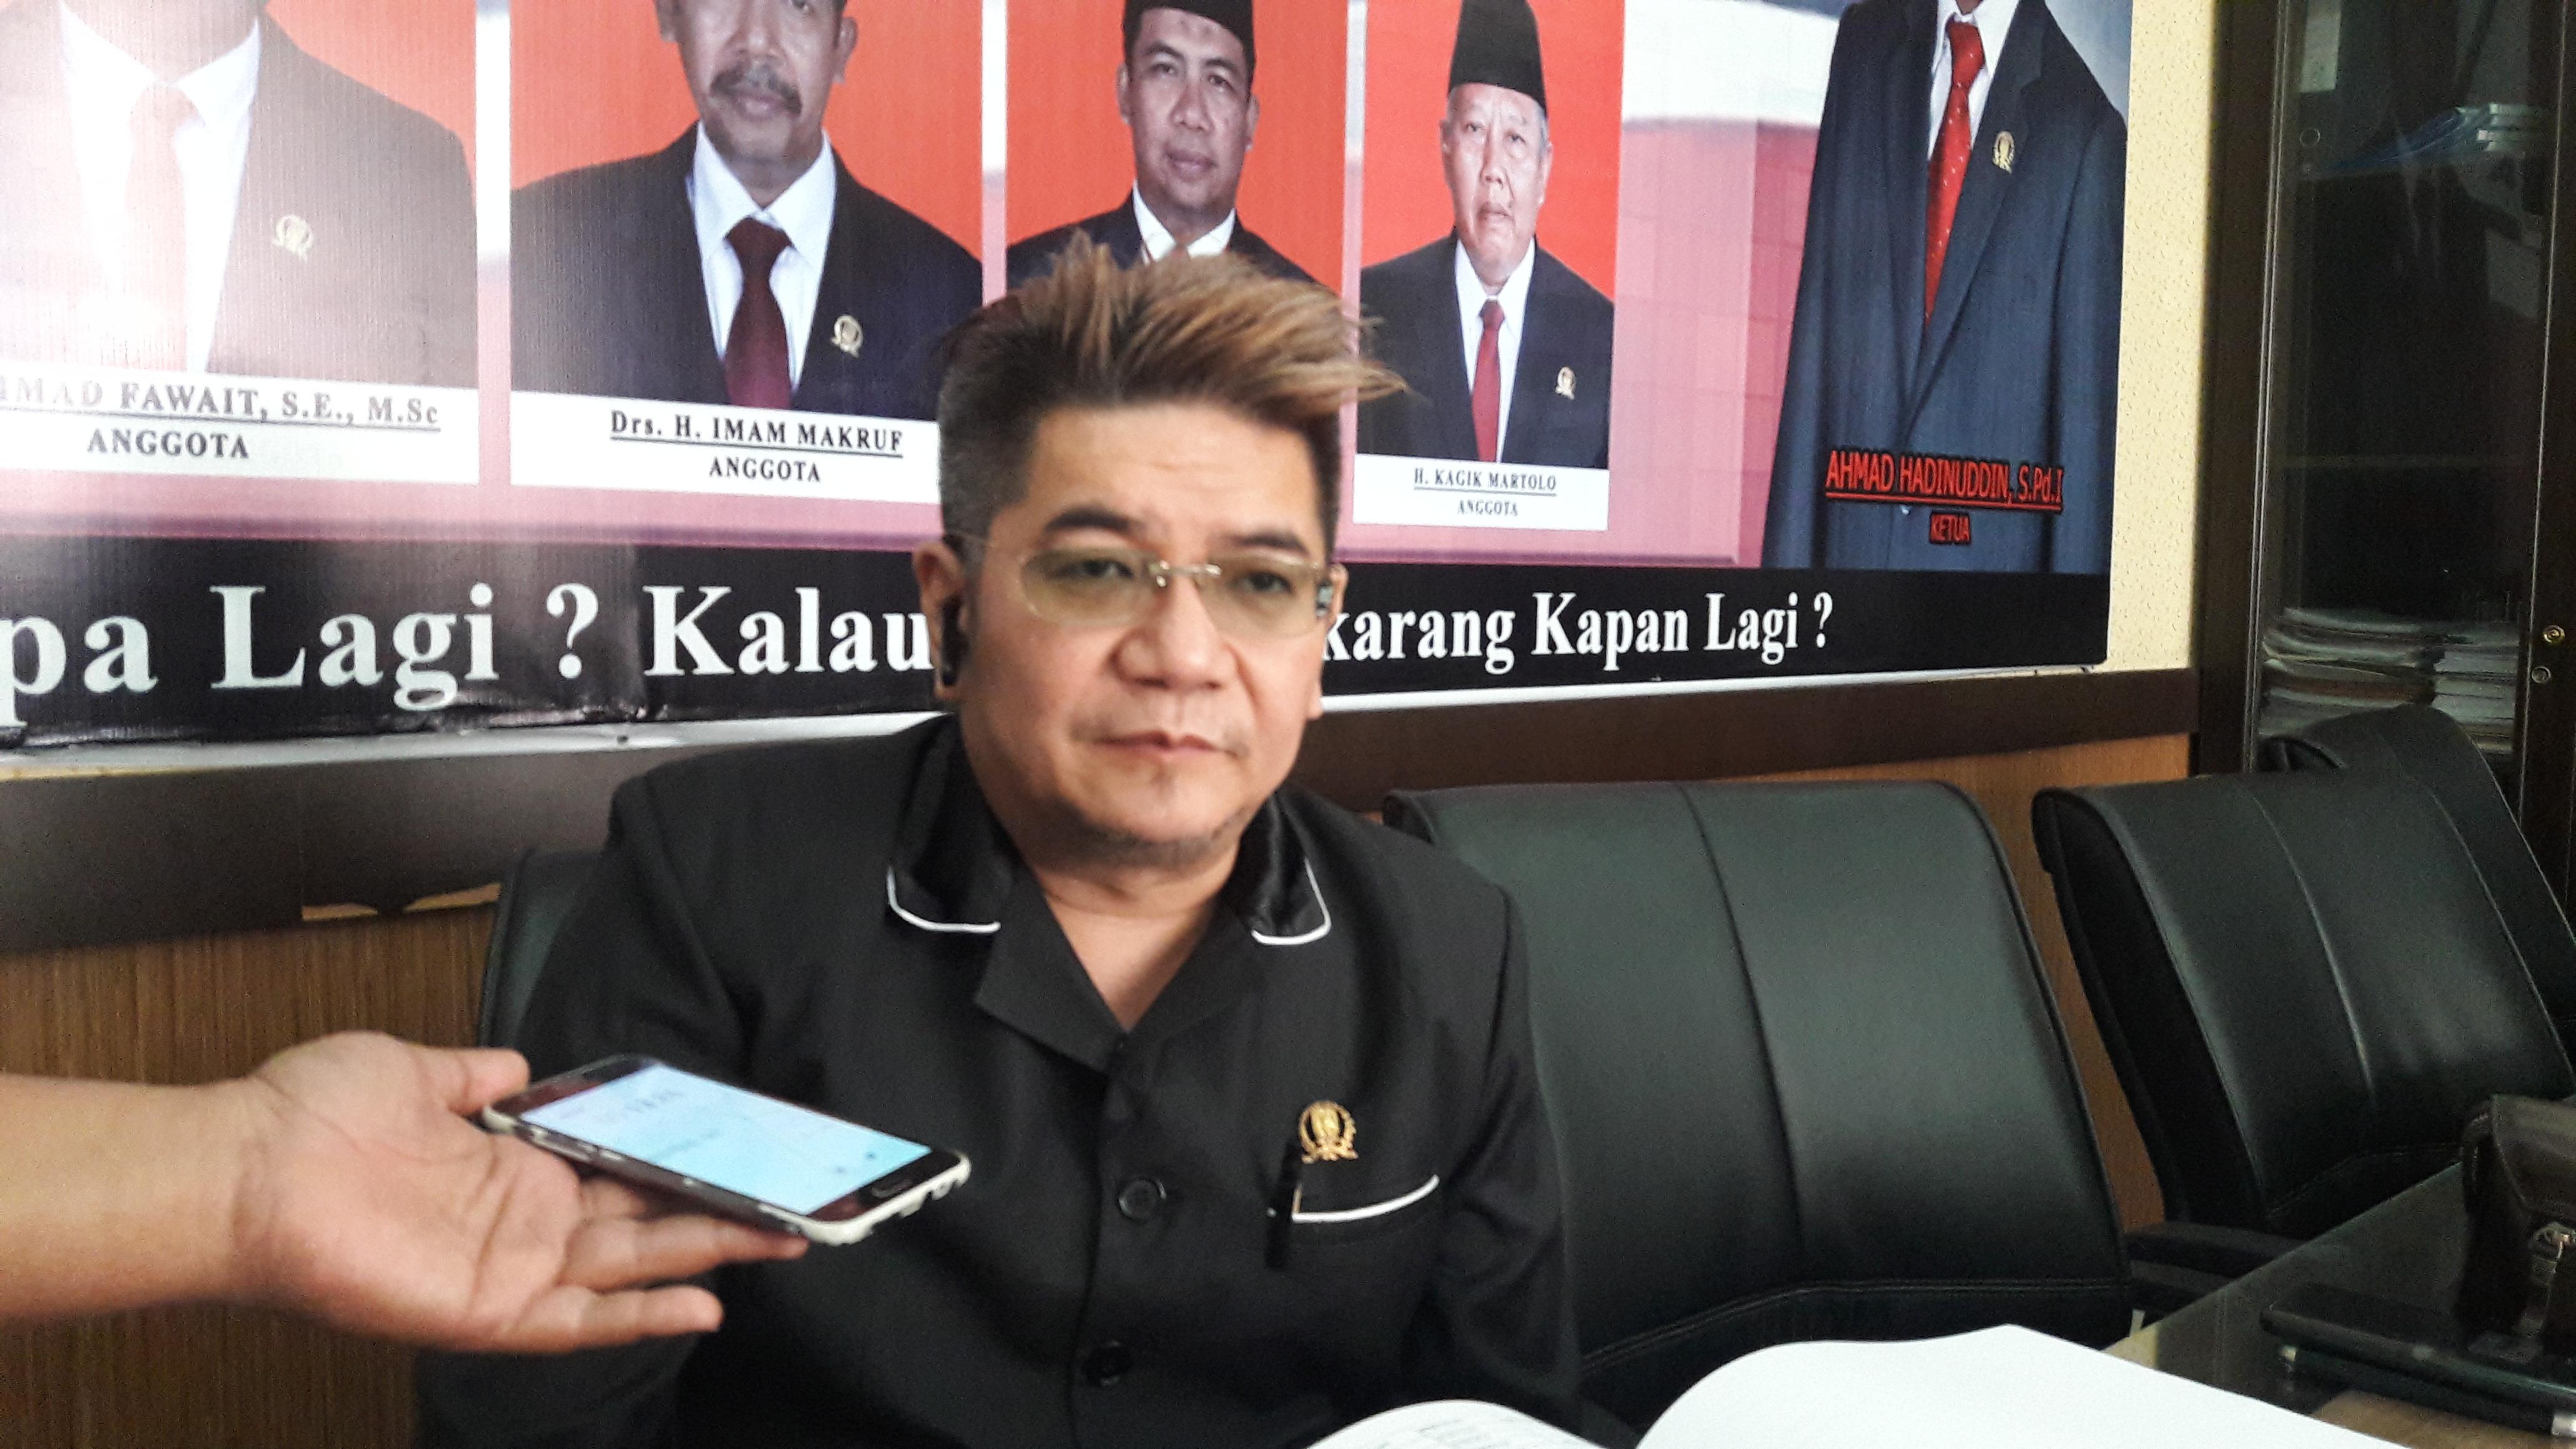 Anggota Komisi E DPRD Jatim Benyamin Kristianto